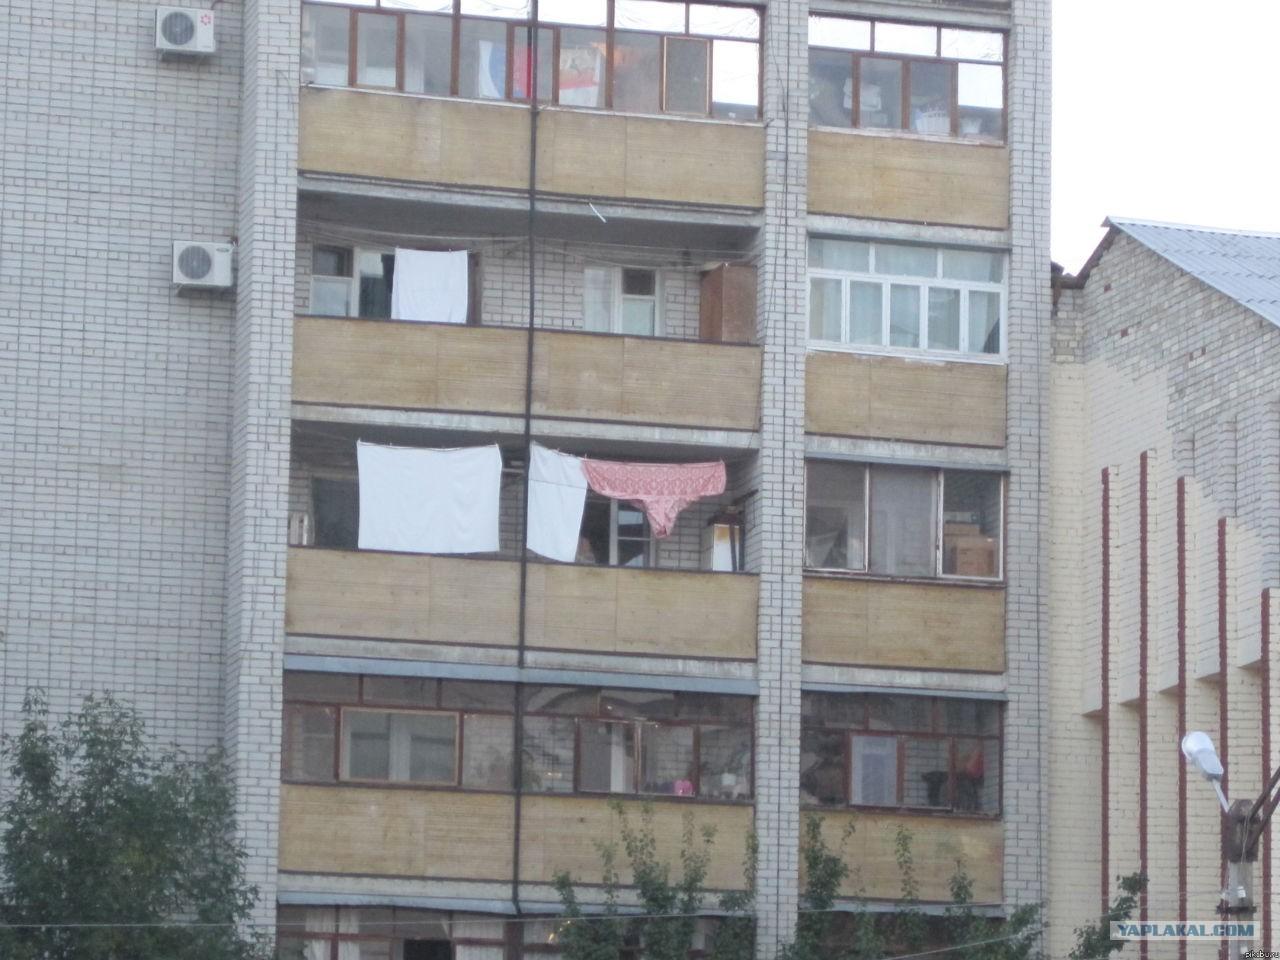 Трусы на балконе фото. - старые - каталог статей - выкладыва.